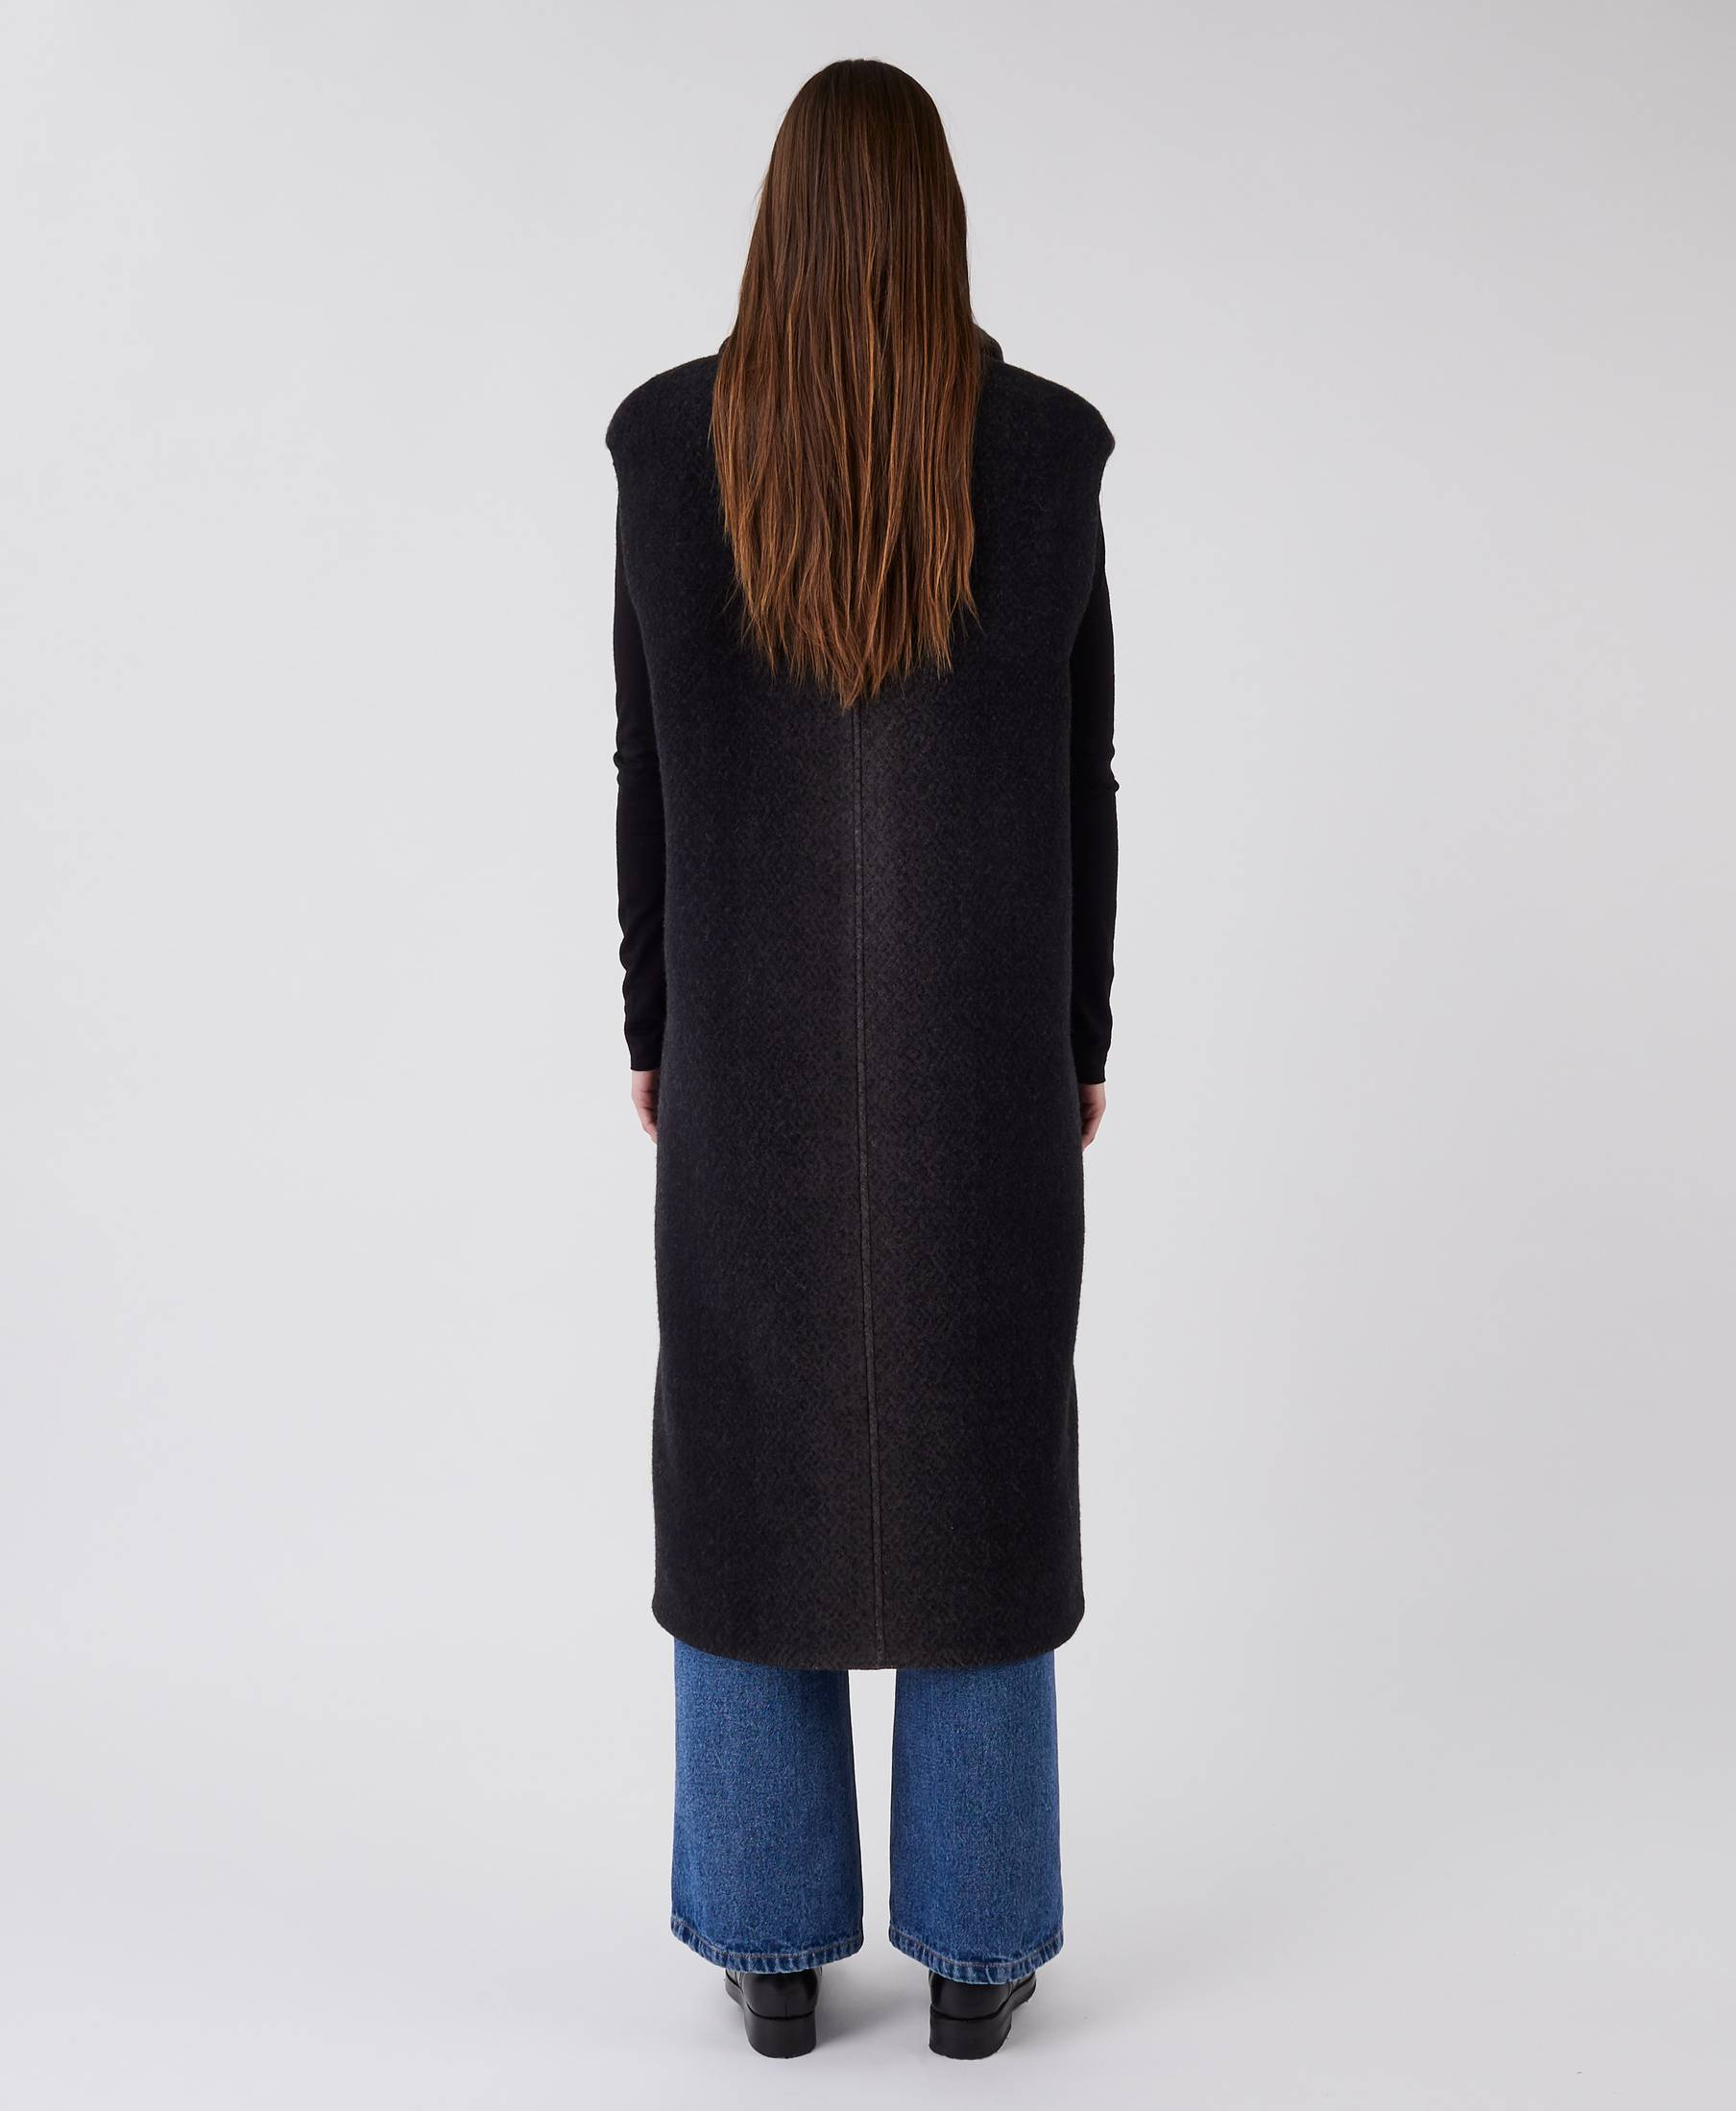 Infinity Vest Gradient Black